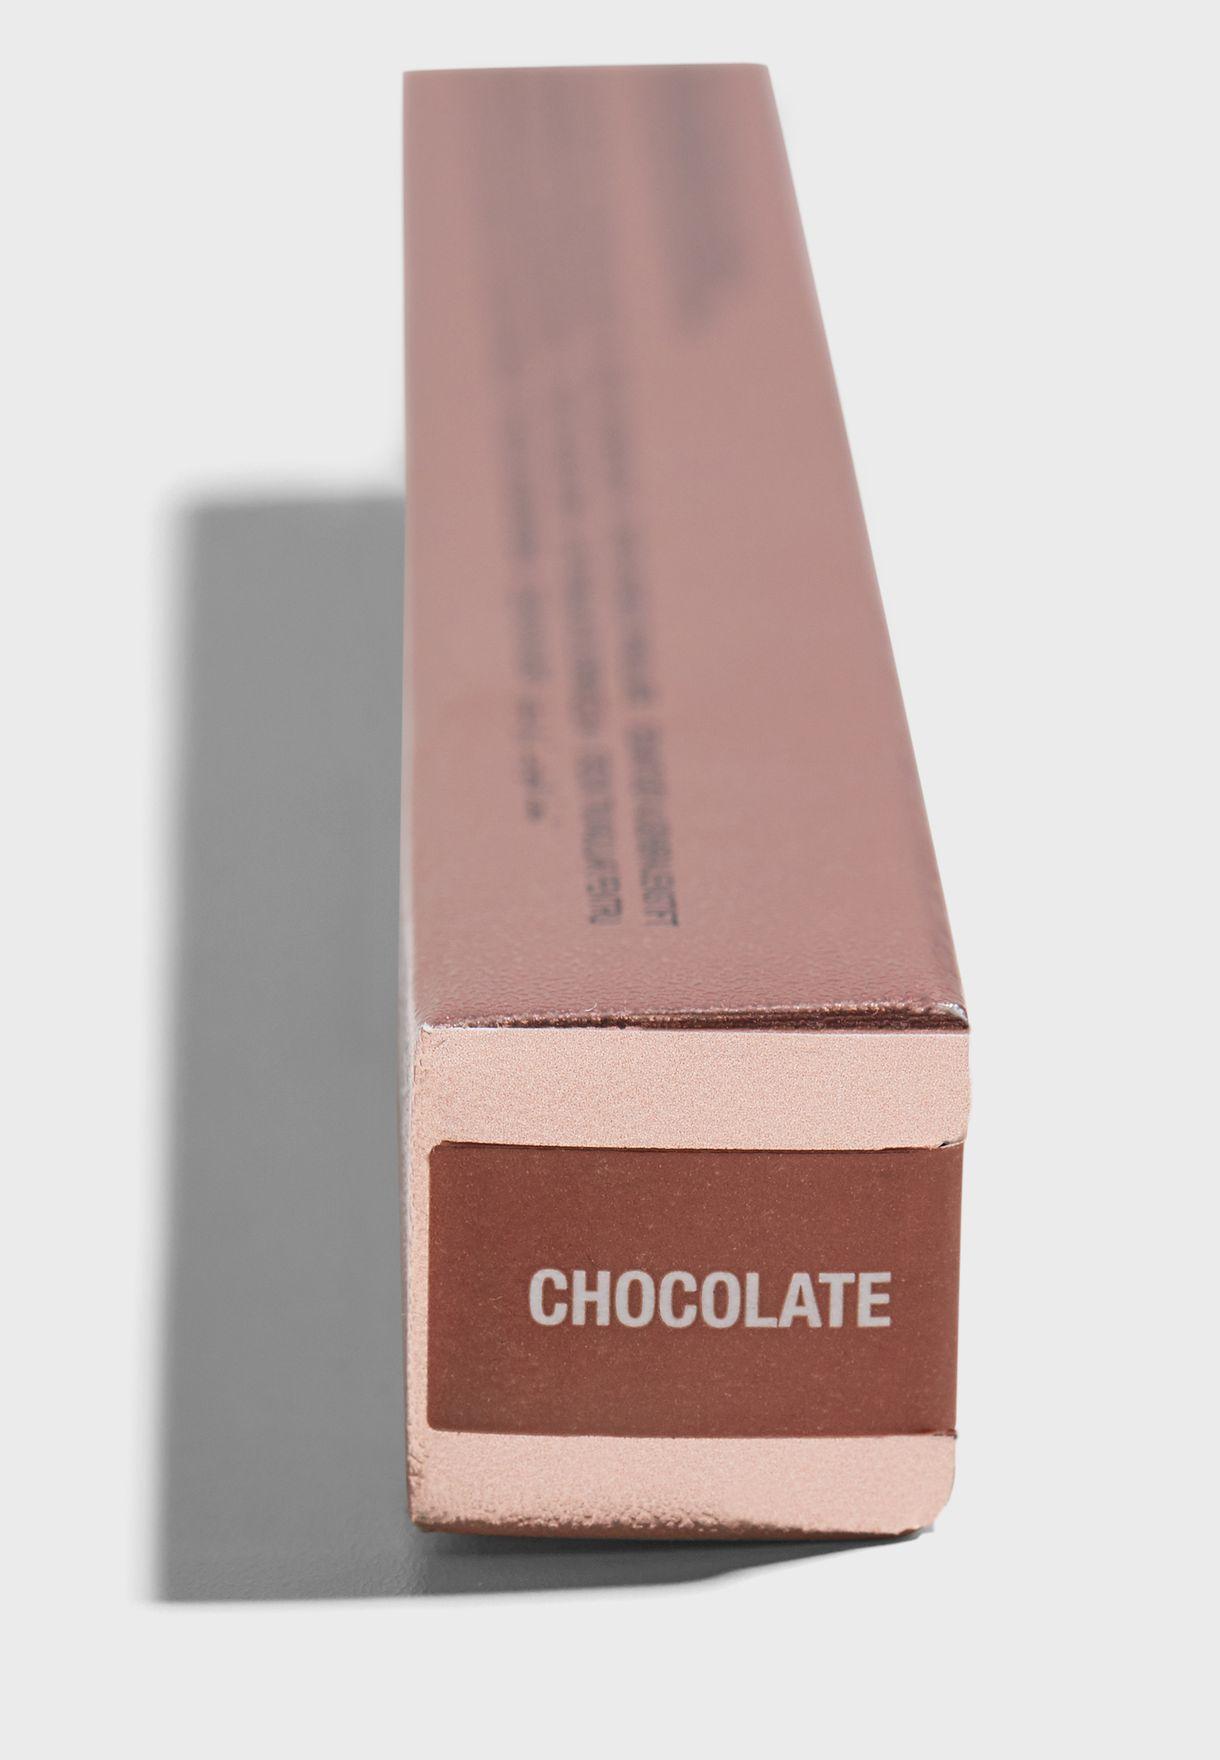 Brow Definer - Chocolate